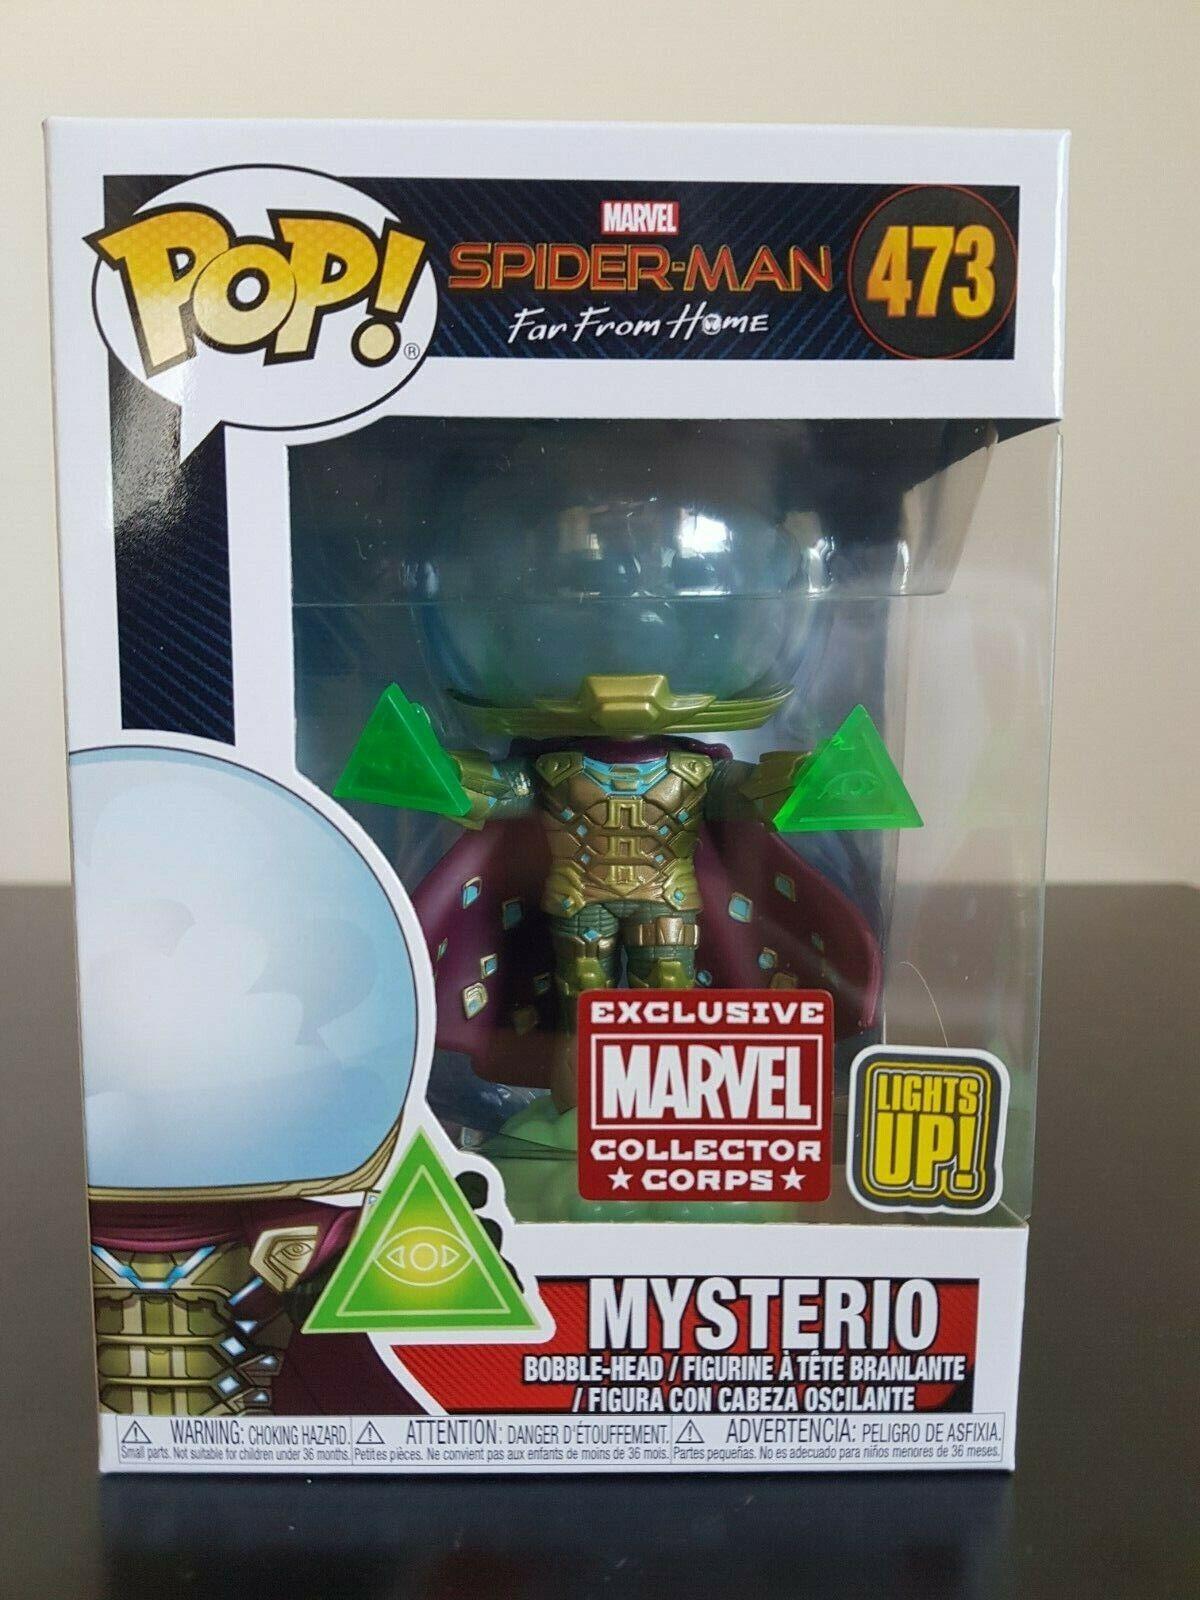 Marvel divertiessitoko Pop  Mysterio Light Up  Marvel Collector Corp  No. 473